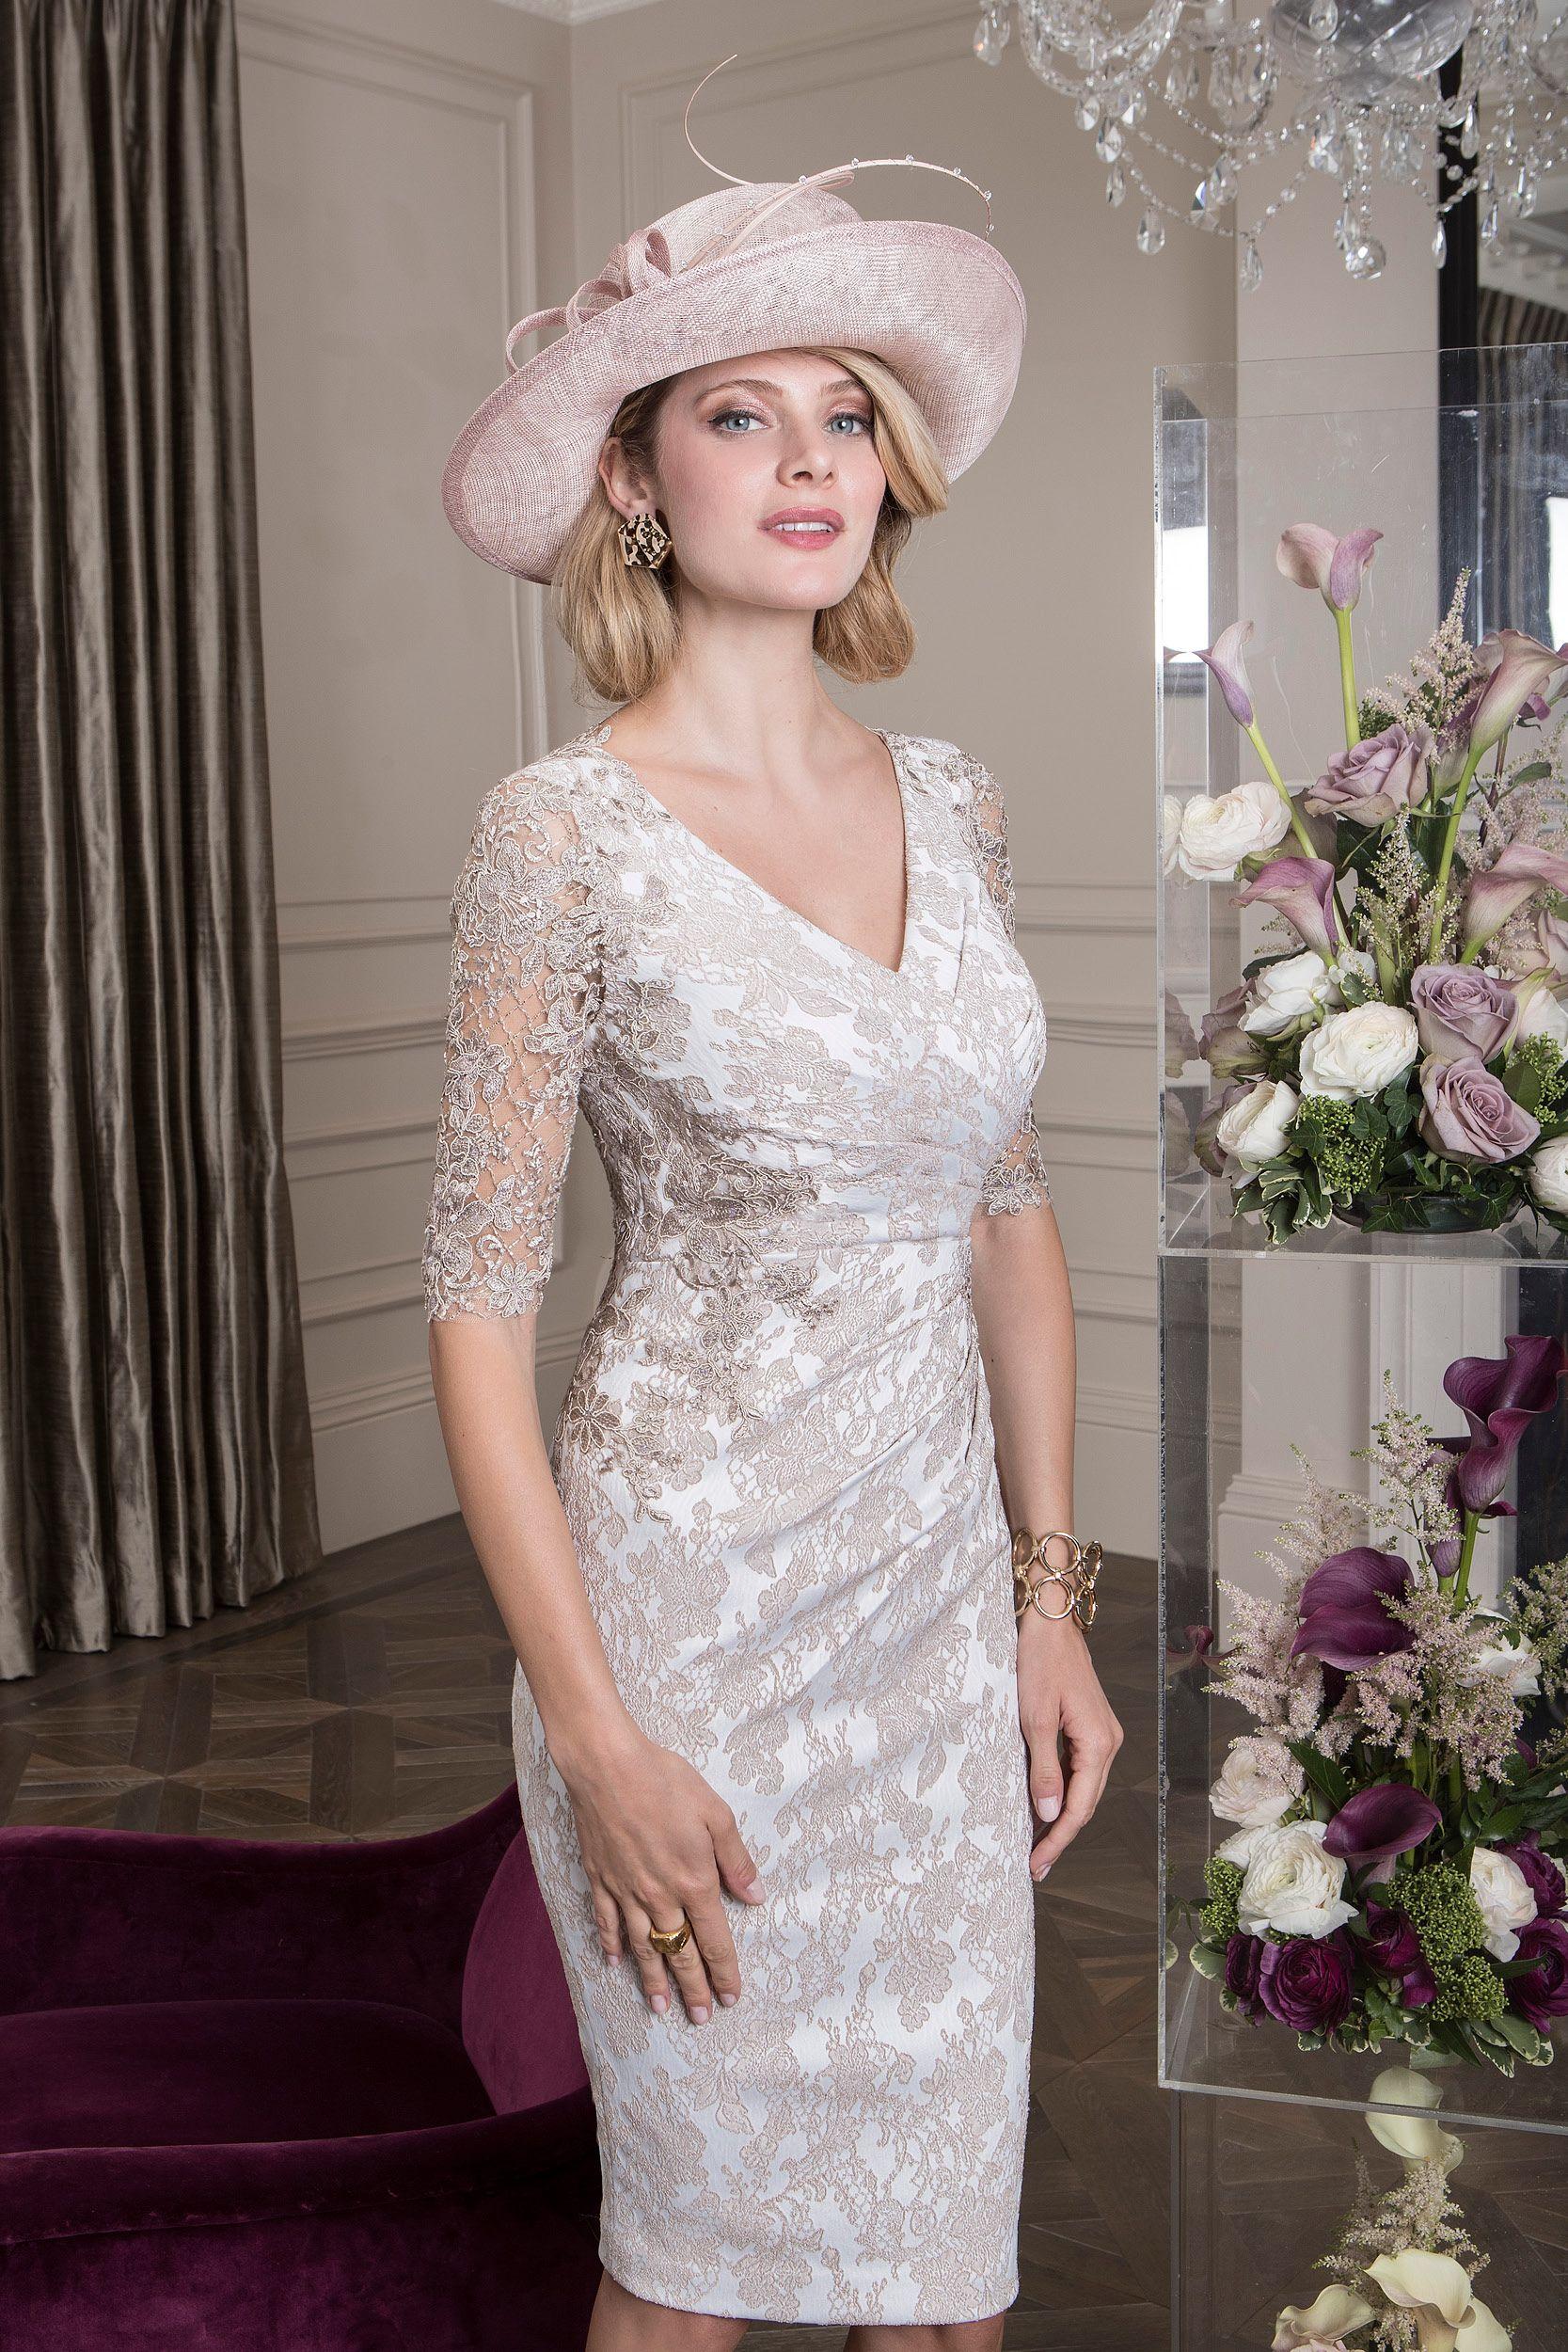 26430 John Charles Dresses Mother Of The Bride Dresses Floral Print Dress